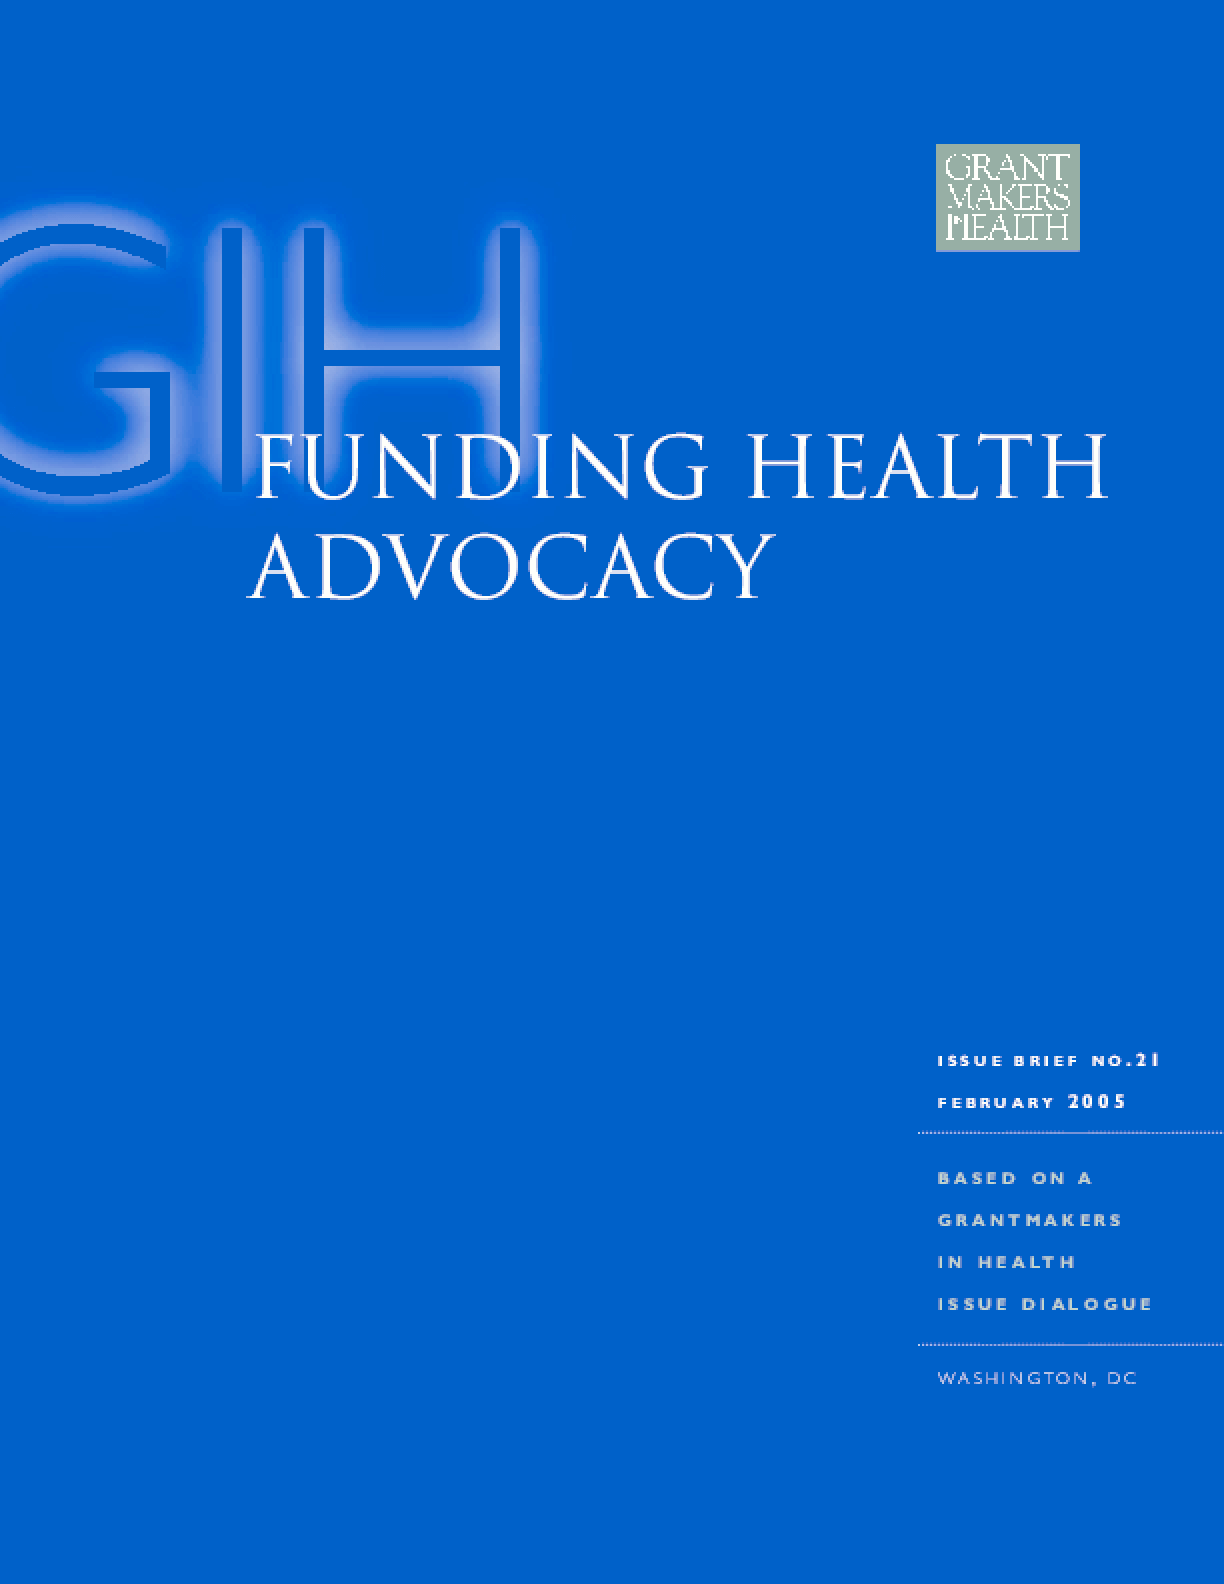 Funding Health Advocacy